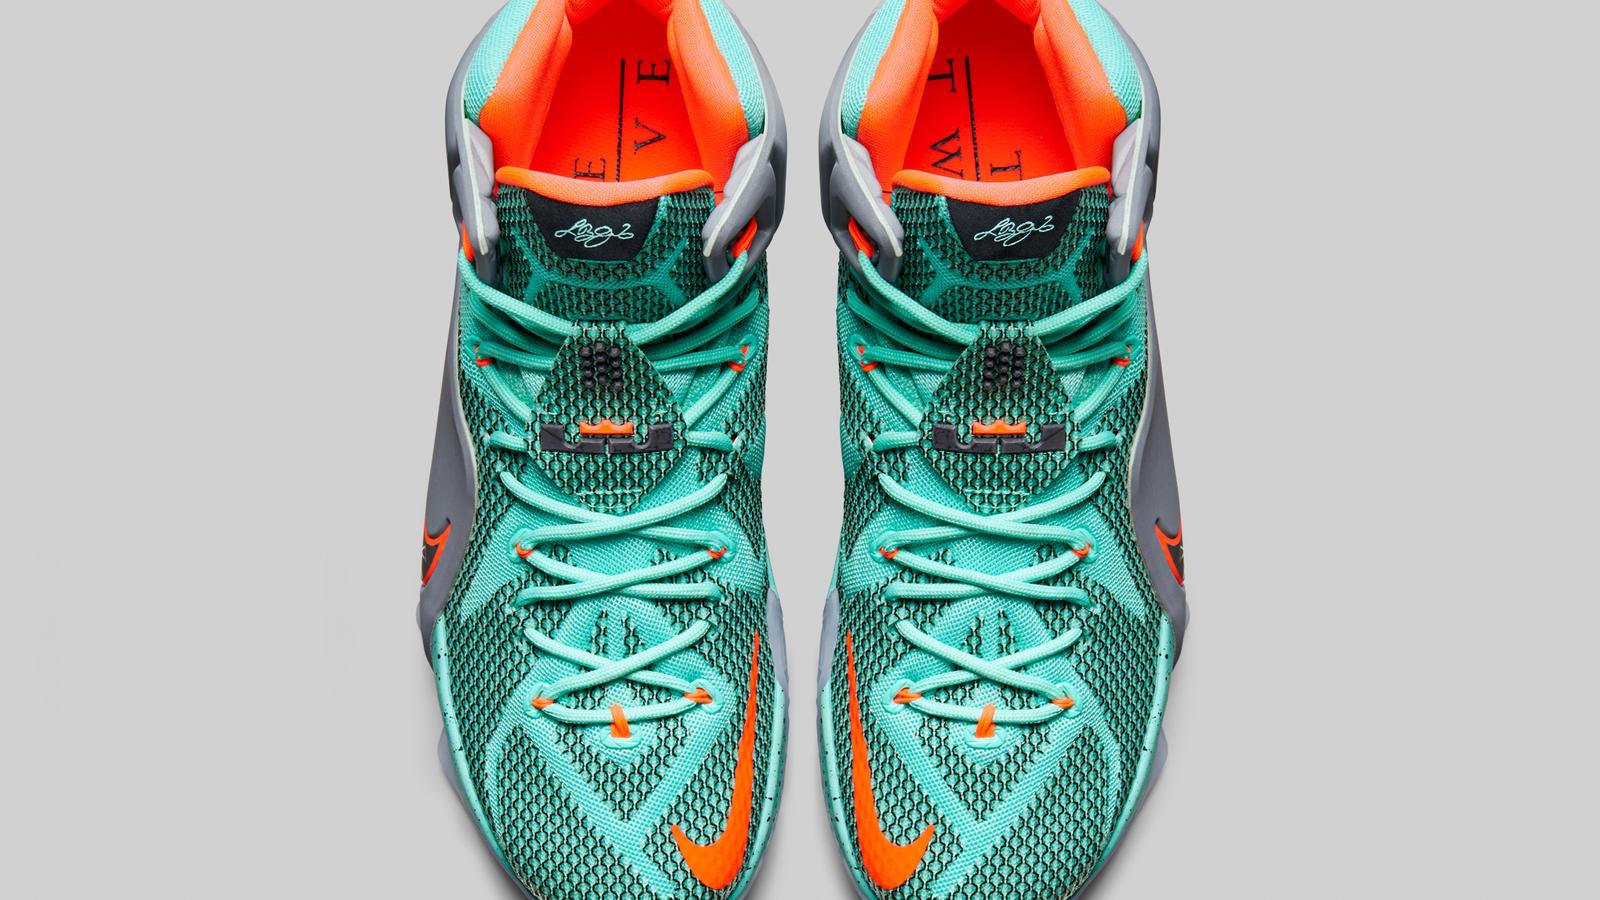 Nike LEBRON 12: Engineered for